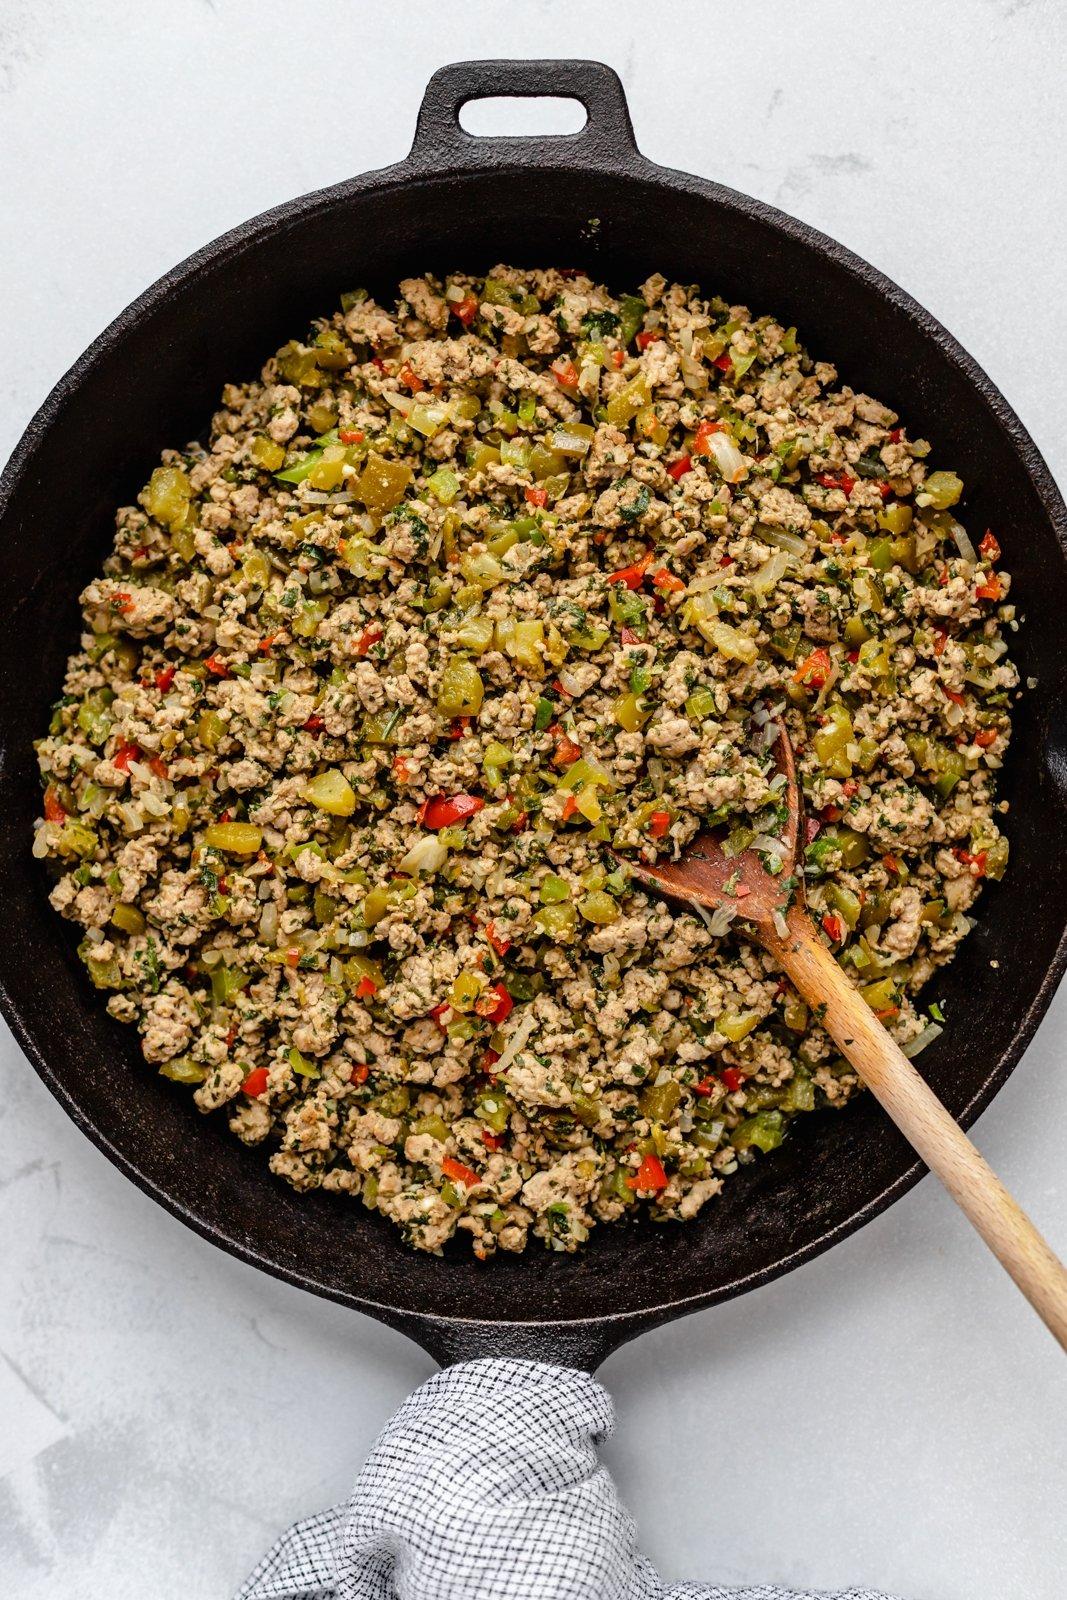 cooking recaito in a pan for green chile chicken burritos